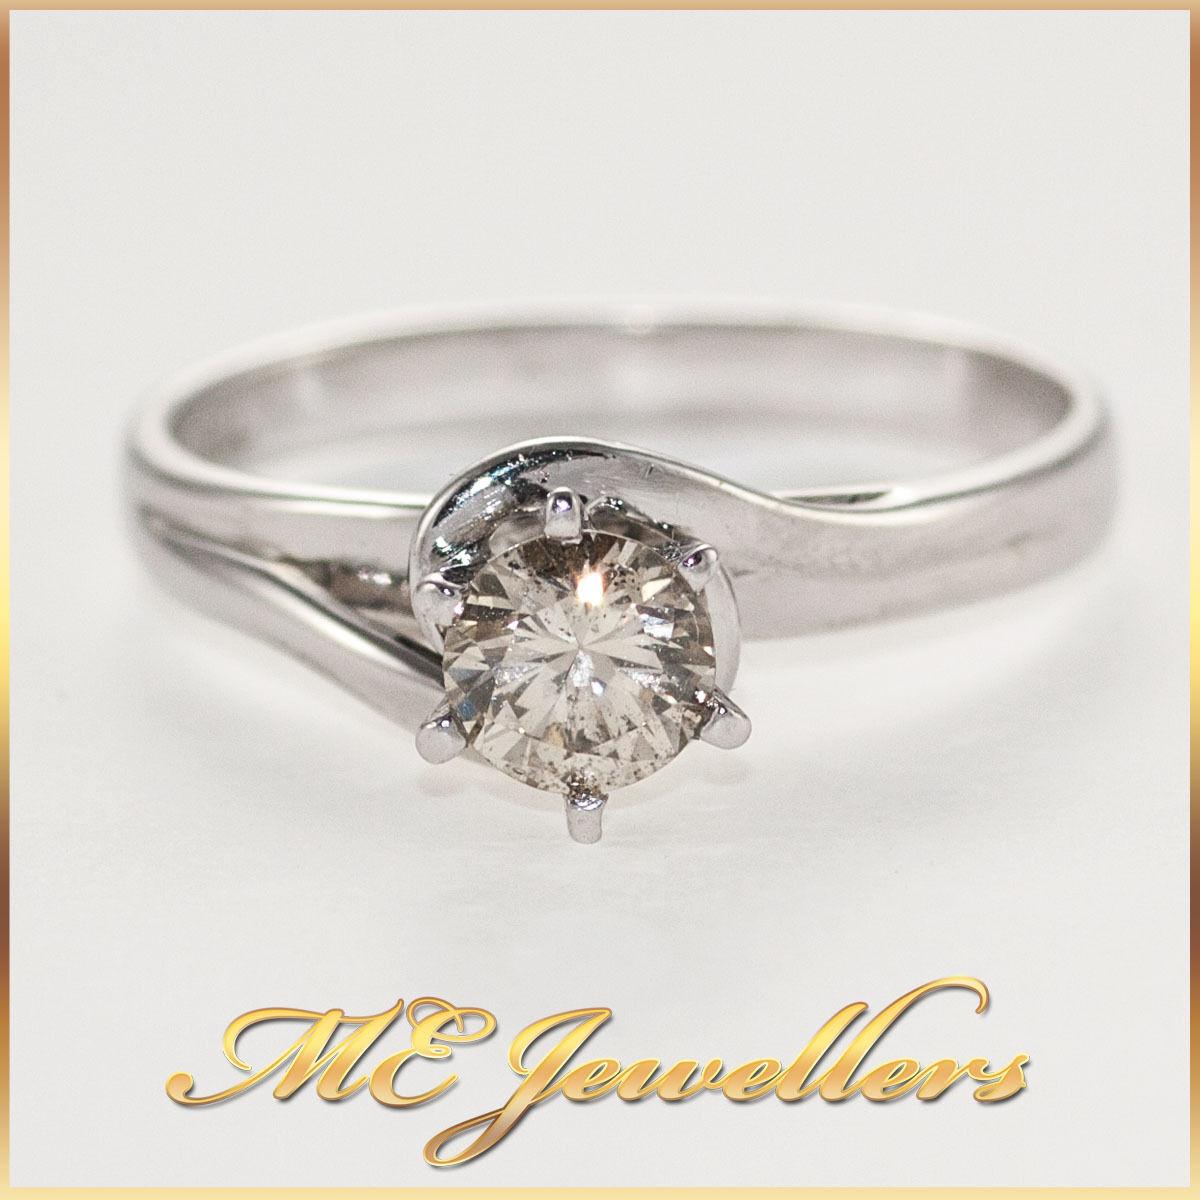 Solid 18K 18 k 750 0.45ct carat Solitaire Diamond ring Round Brilliant Cut Twirl